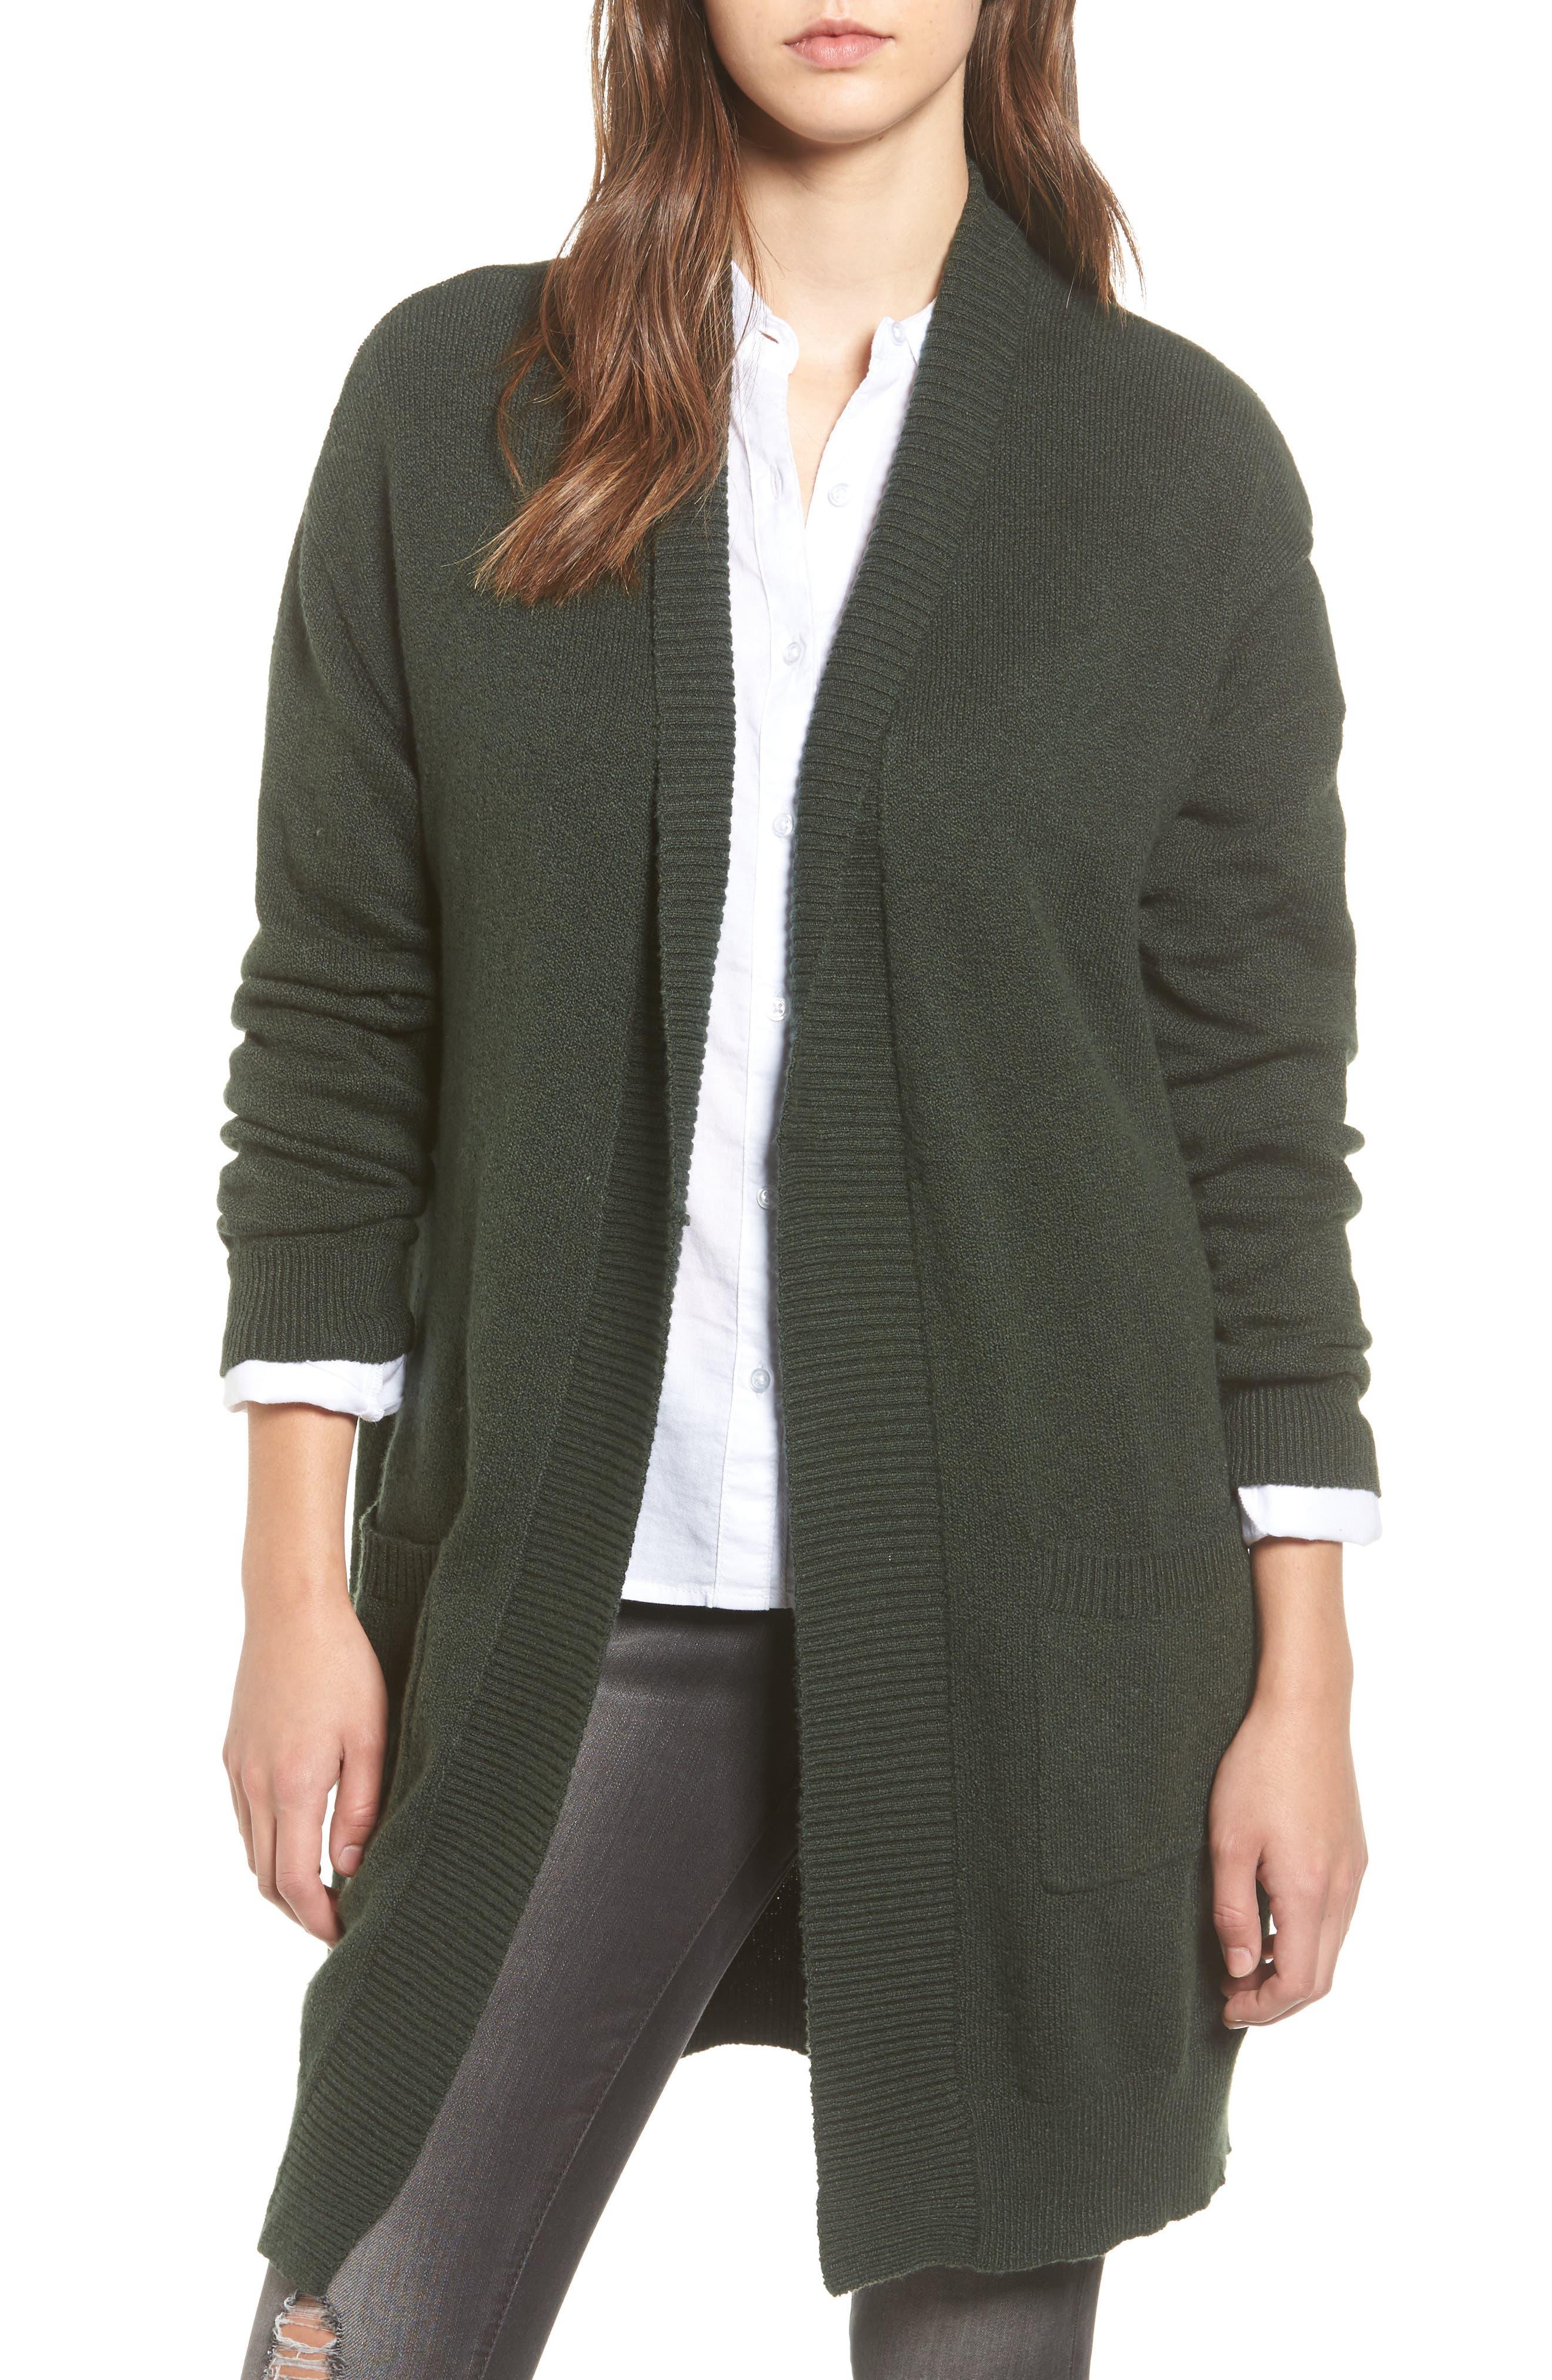 Green Cardigan Sweaters & Sweatshirts, Cowl Necks, Cable Knits ...